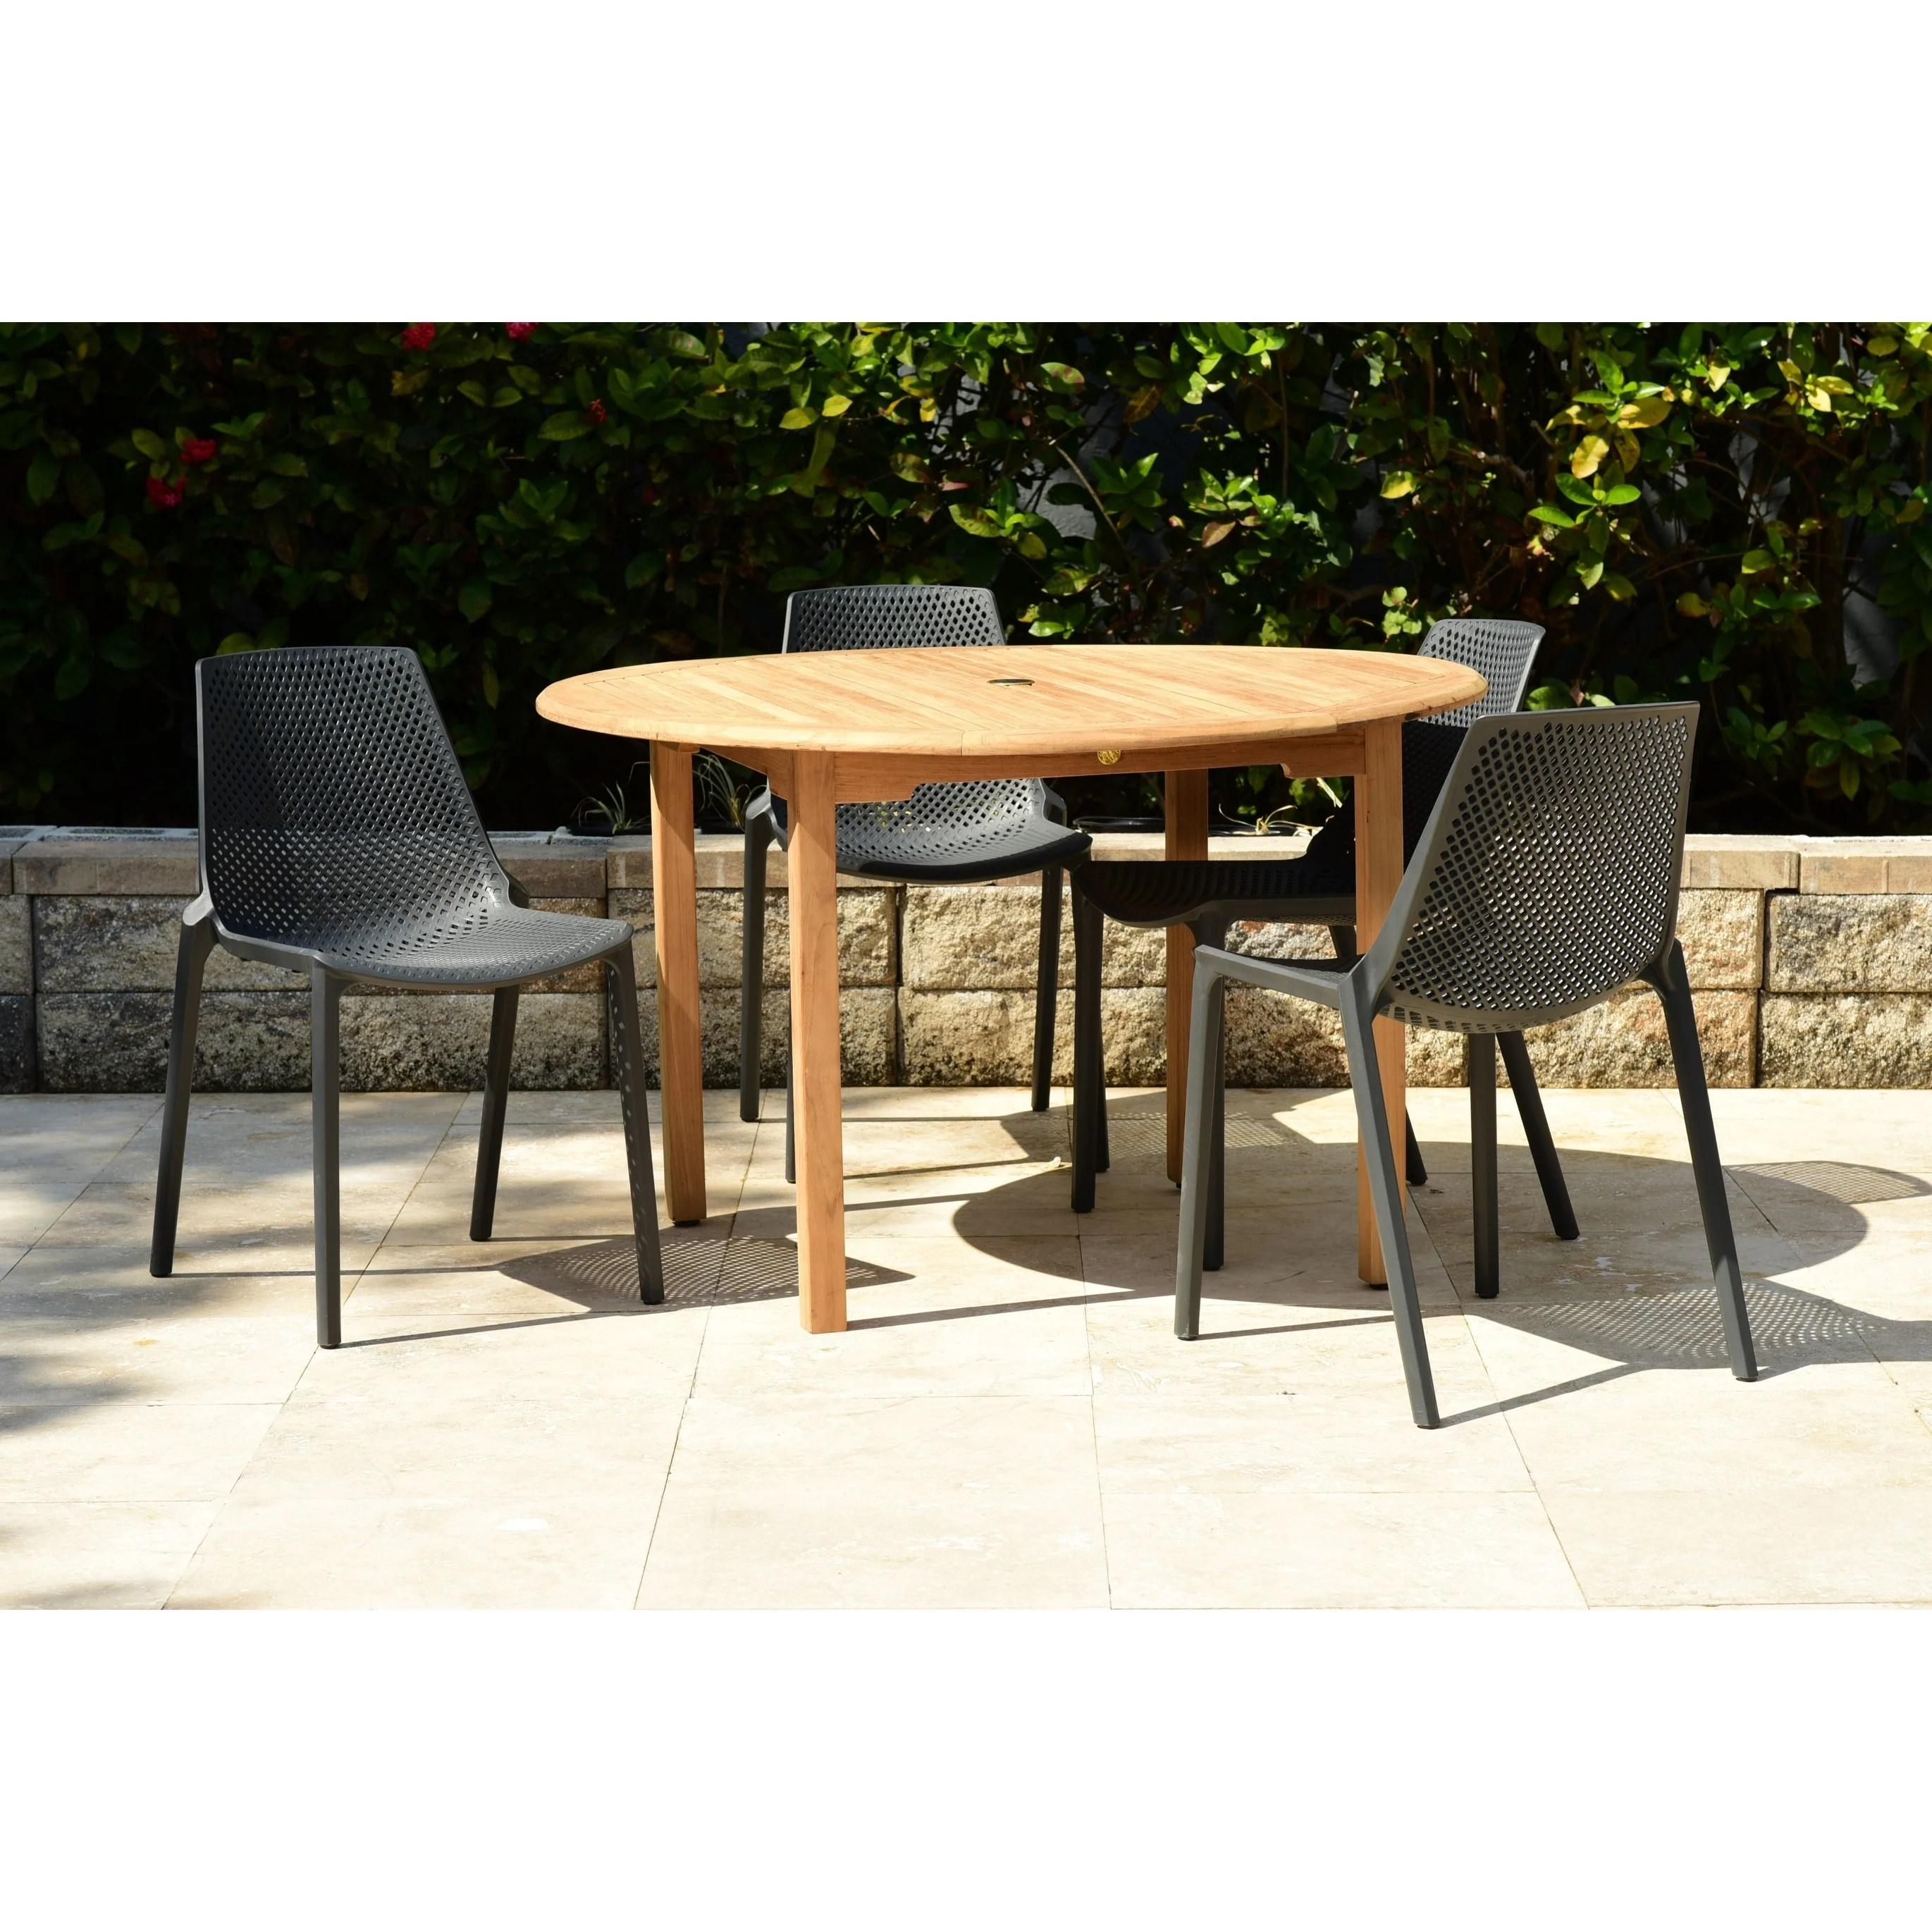 amazonia teak nassau white 5 piece round sidechair patio dining set